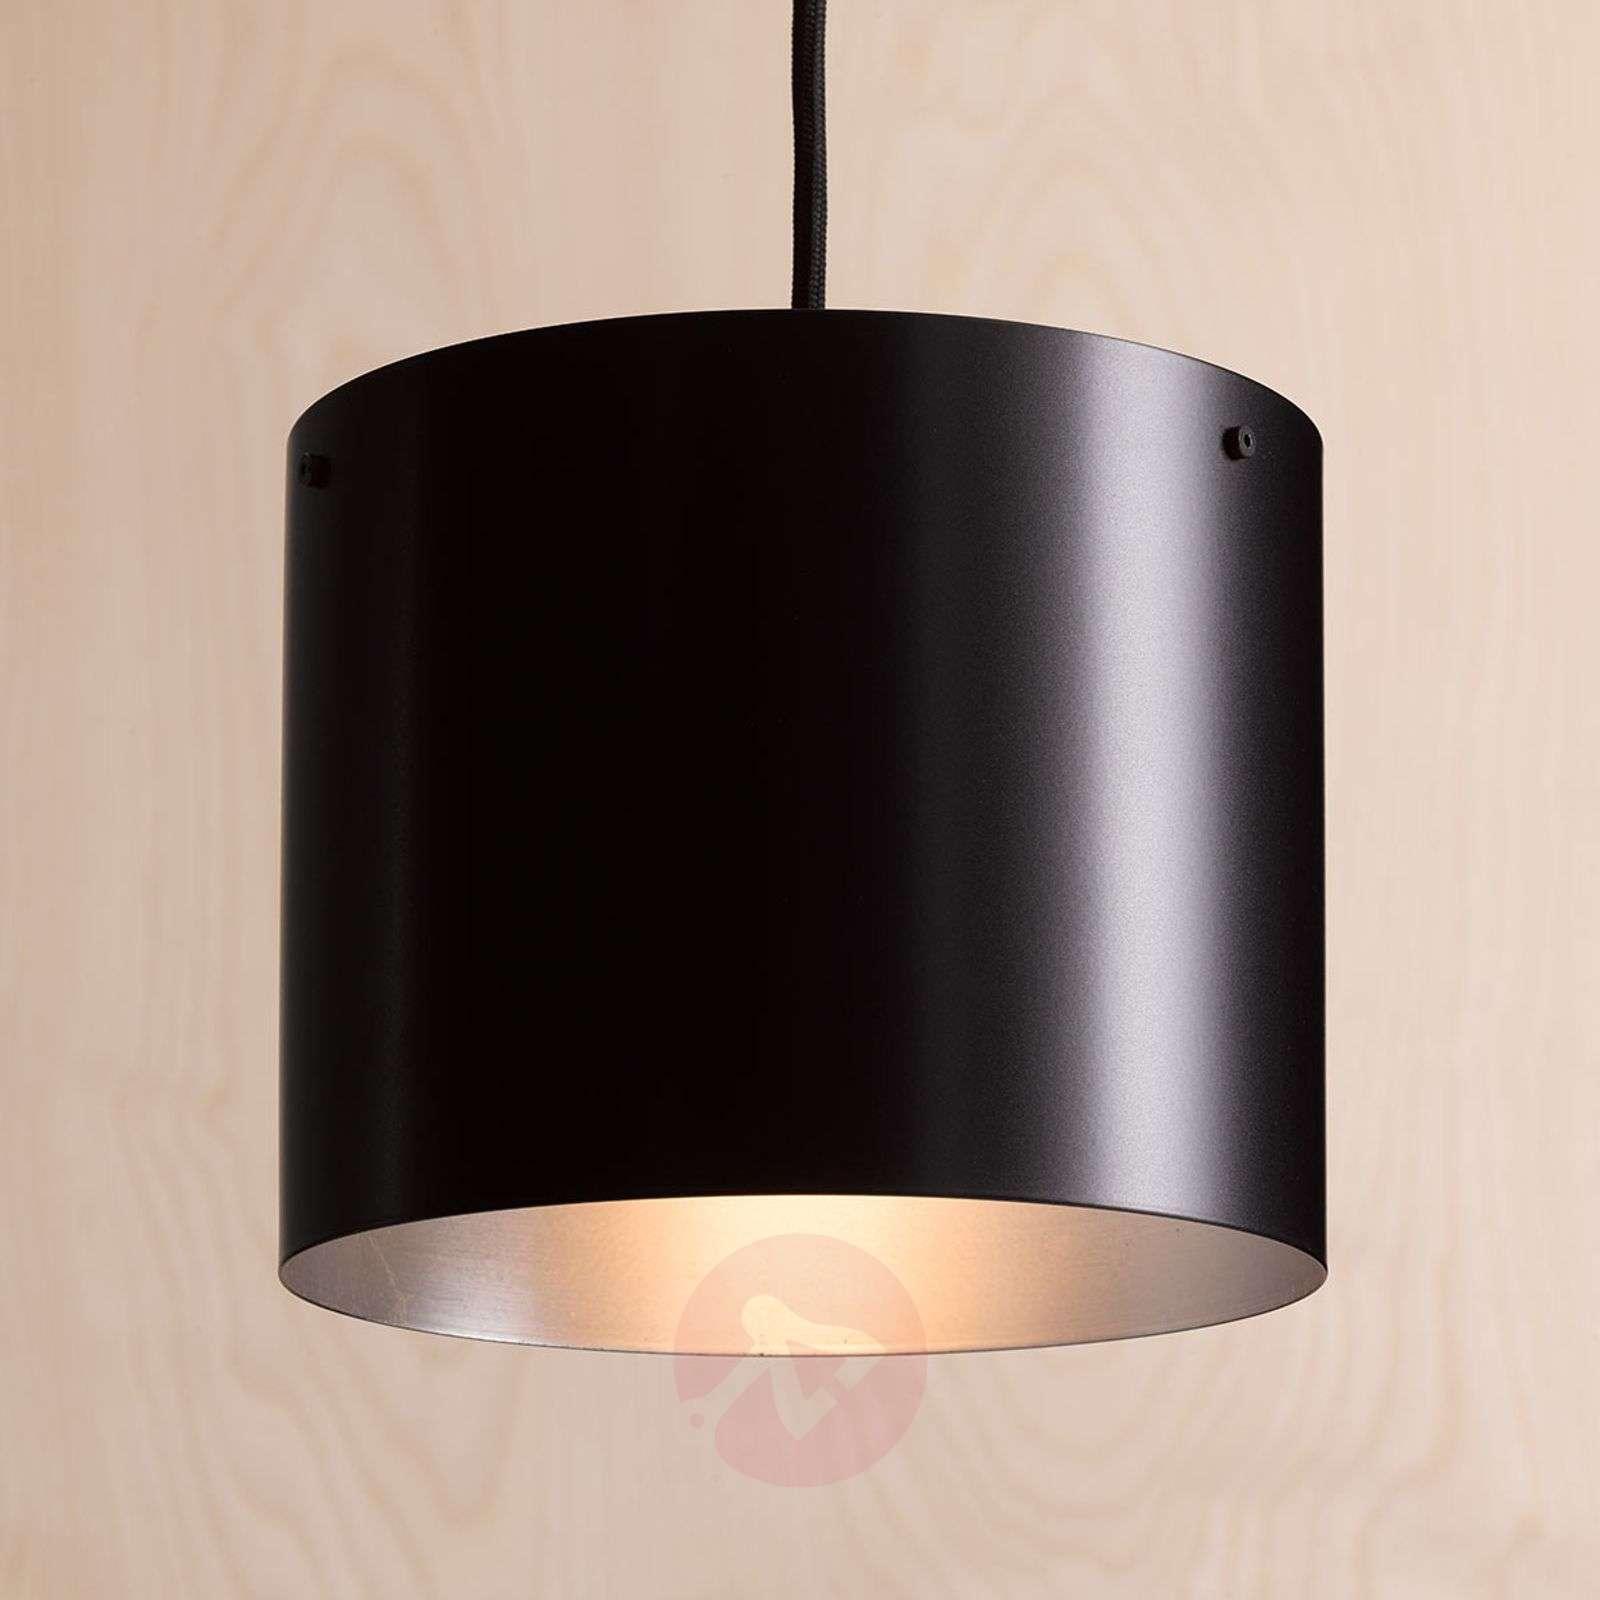 Design-LED-riippuvalaisin Afra, musta-hopea-1071002-01